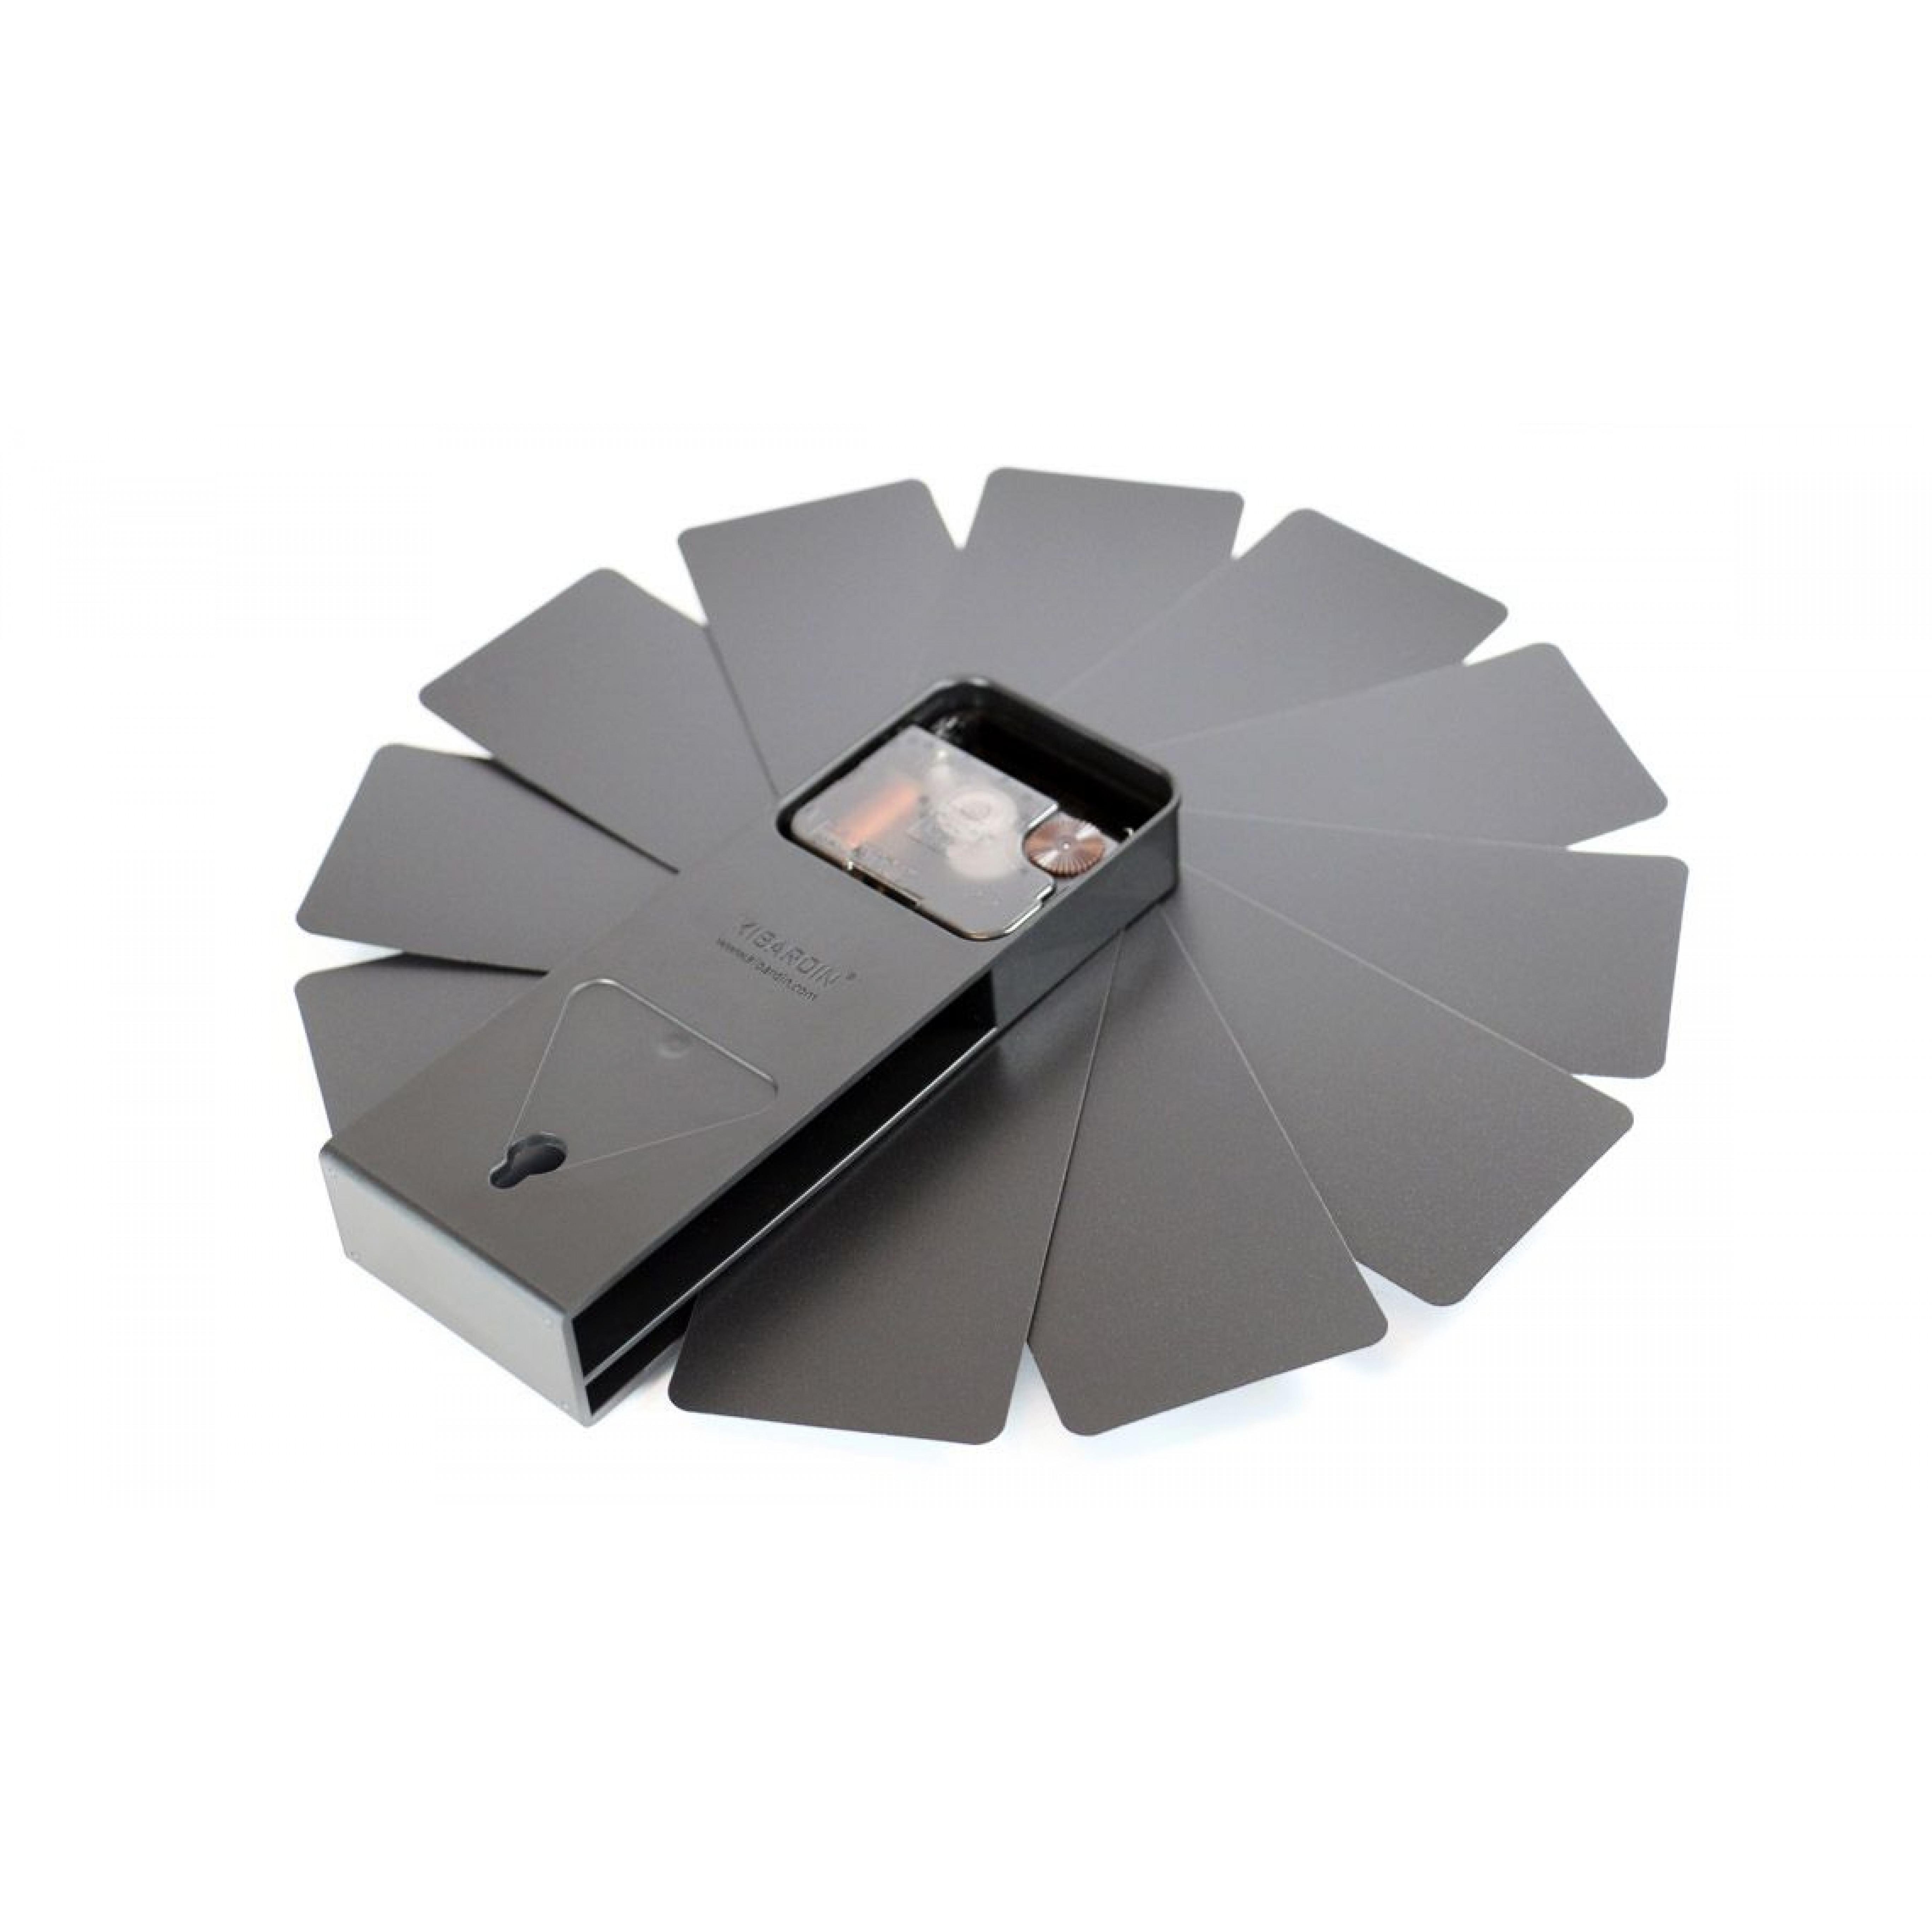 Desk/Wall Foldable Analog Clock Transformer   Black & Black